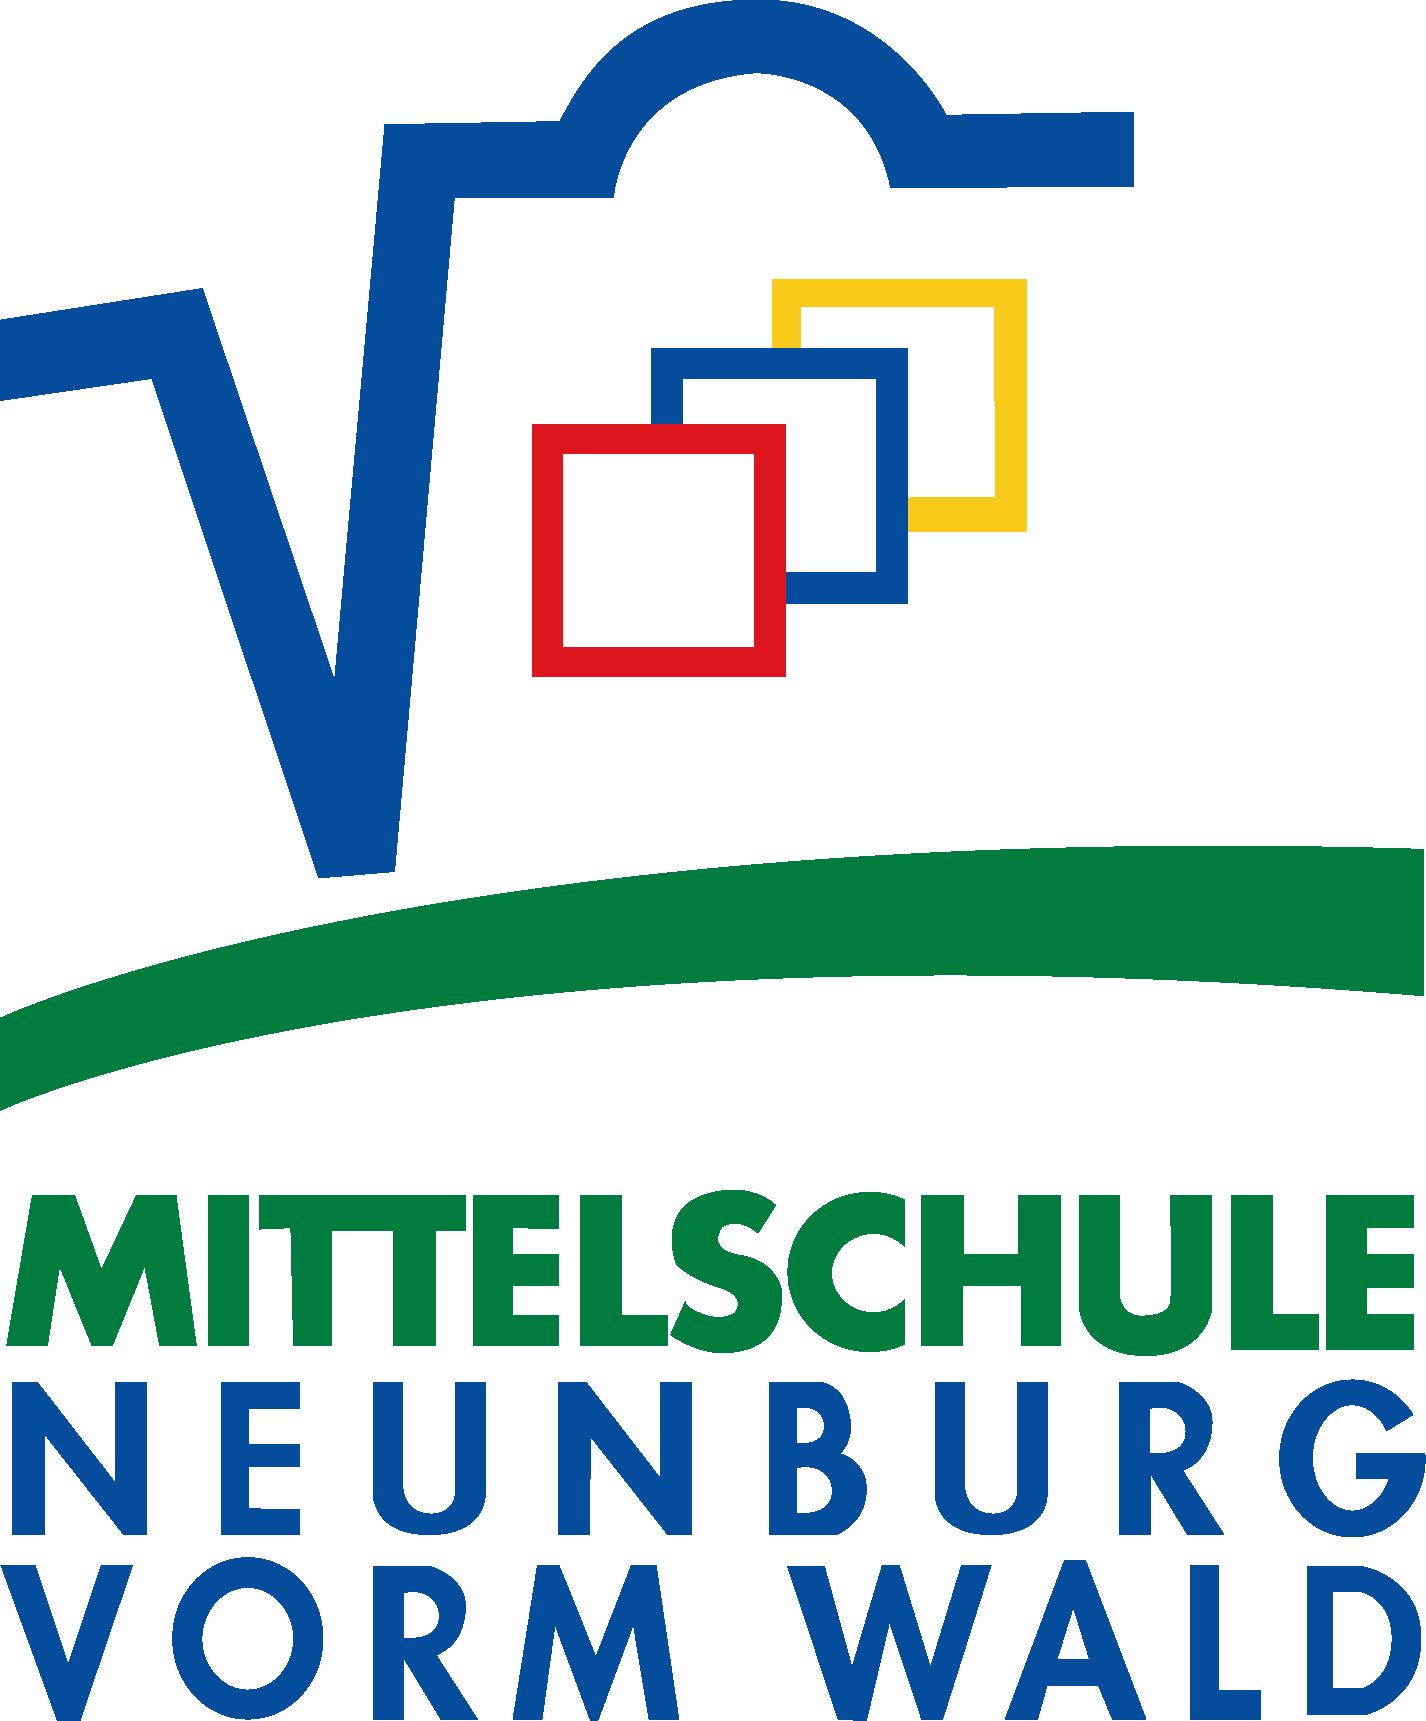 Mittelschule Neunburg